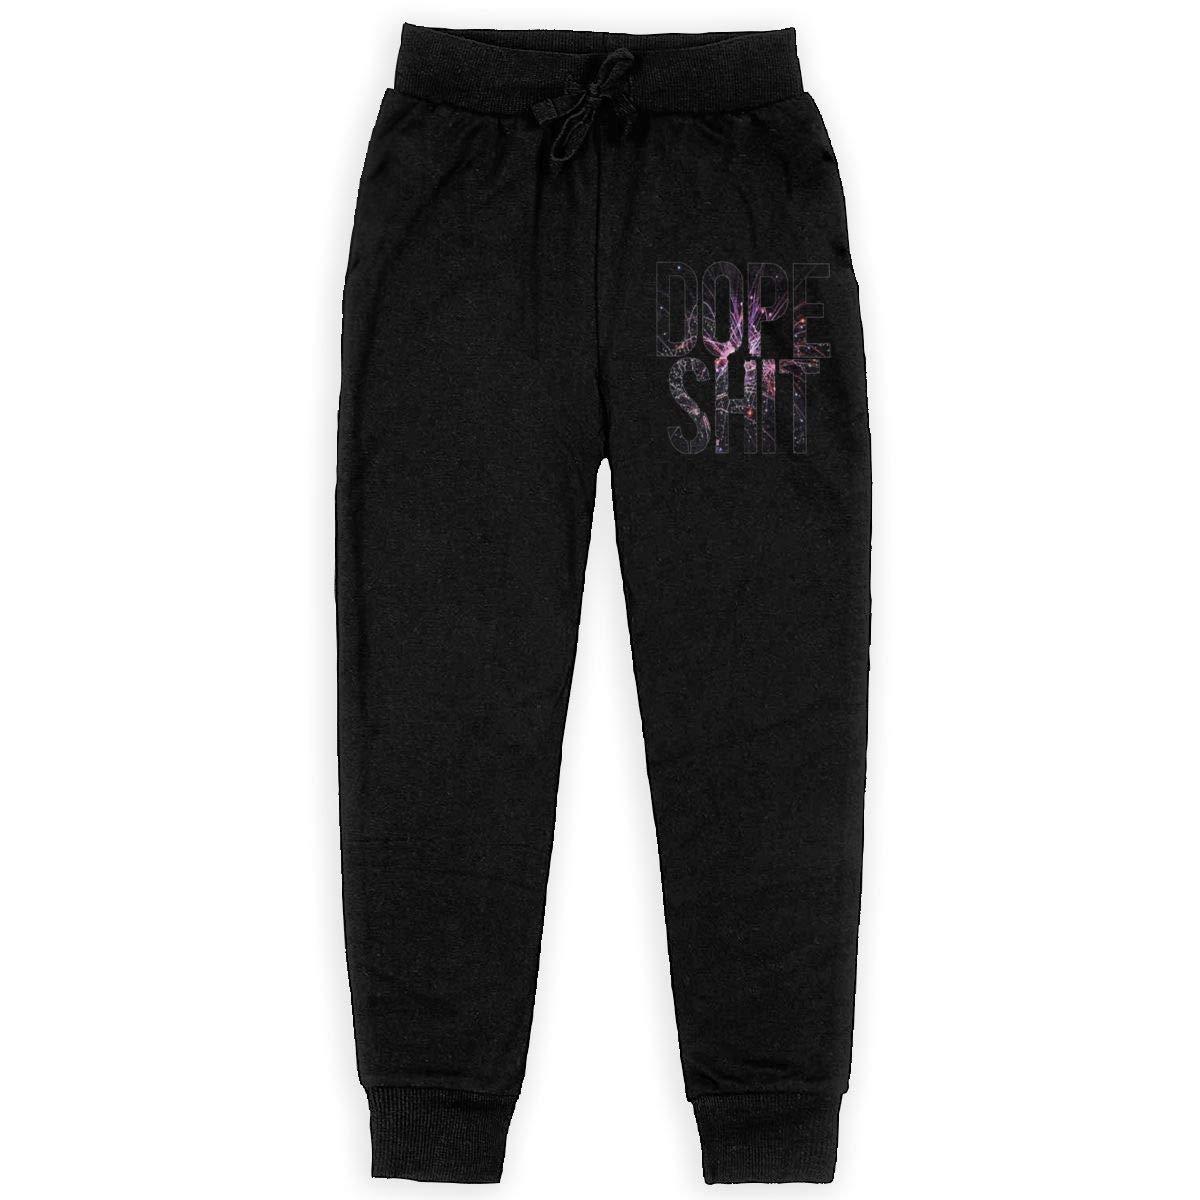 Dope Shit Boys Sweatpants,Joggers Sport Training Pants Trousers Black